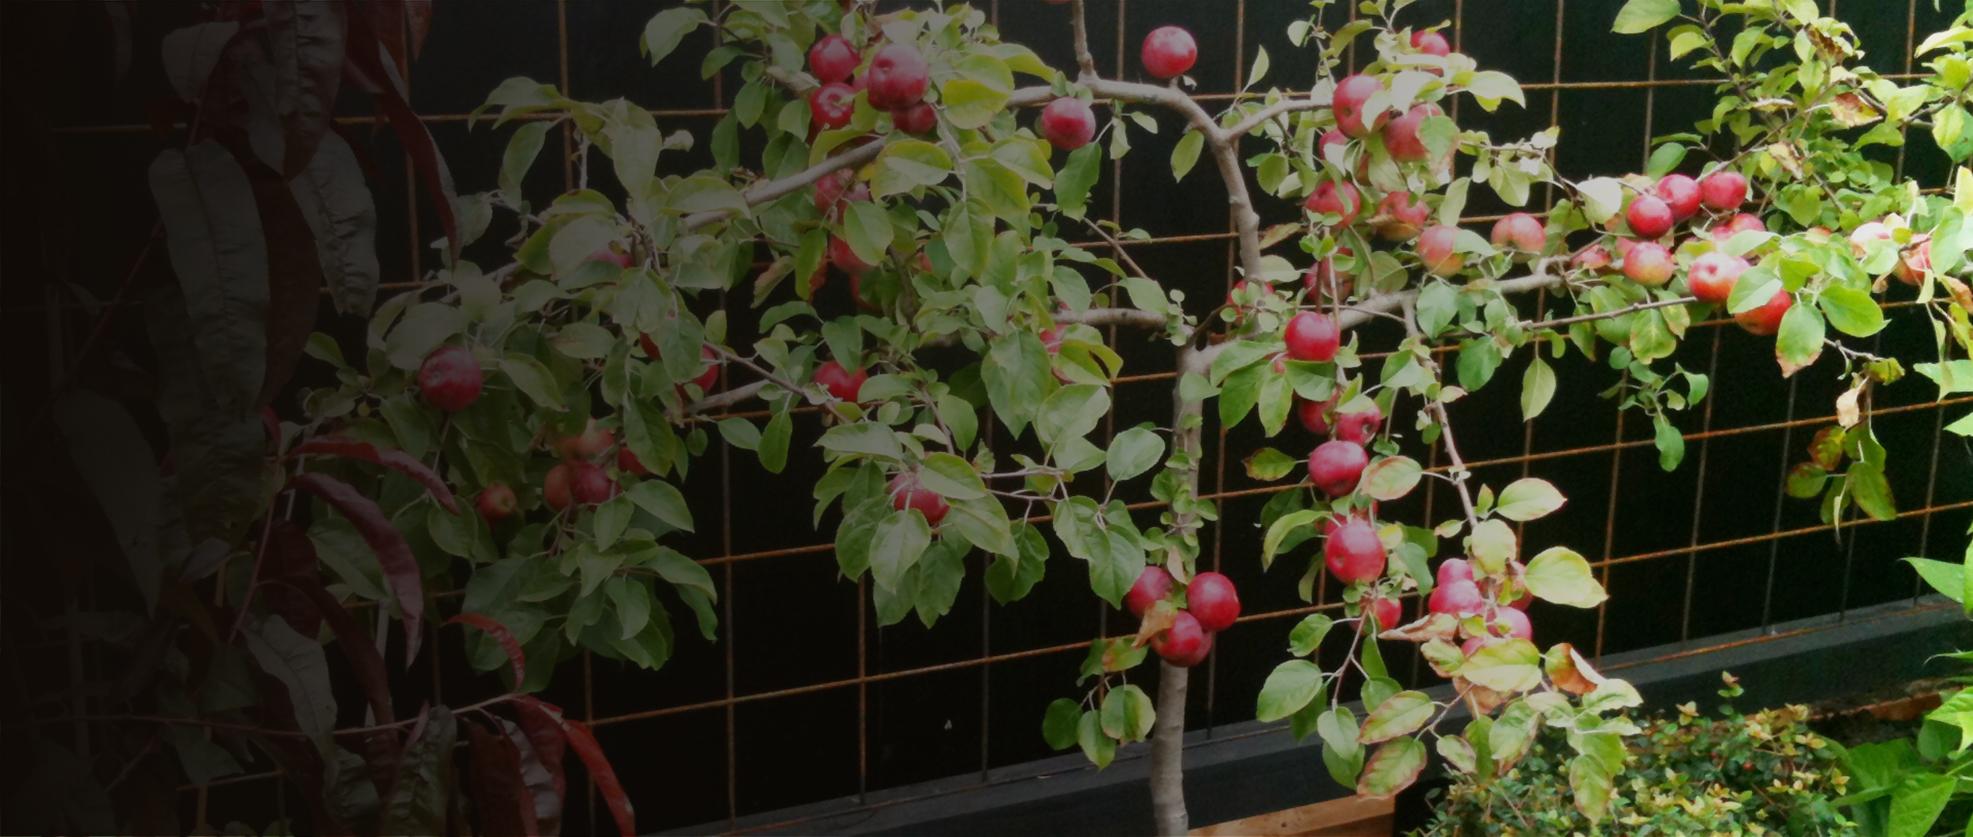 fruit  nut  berry ornamental tree producers